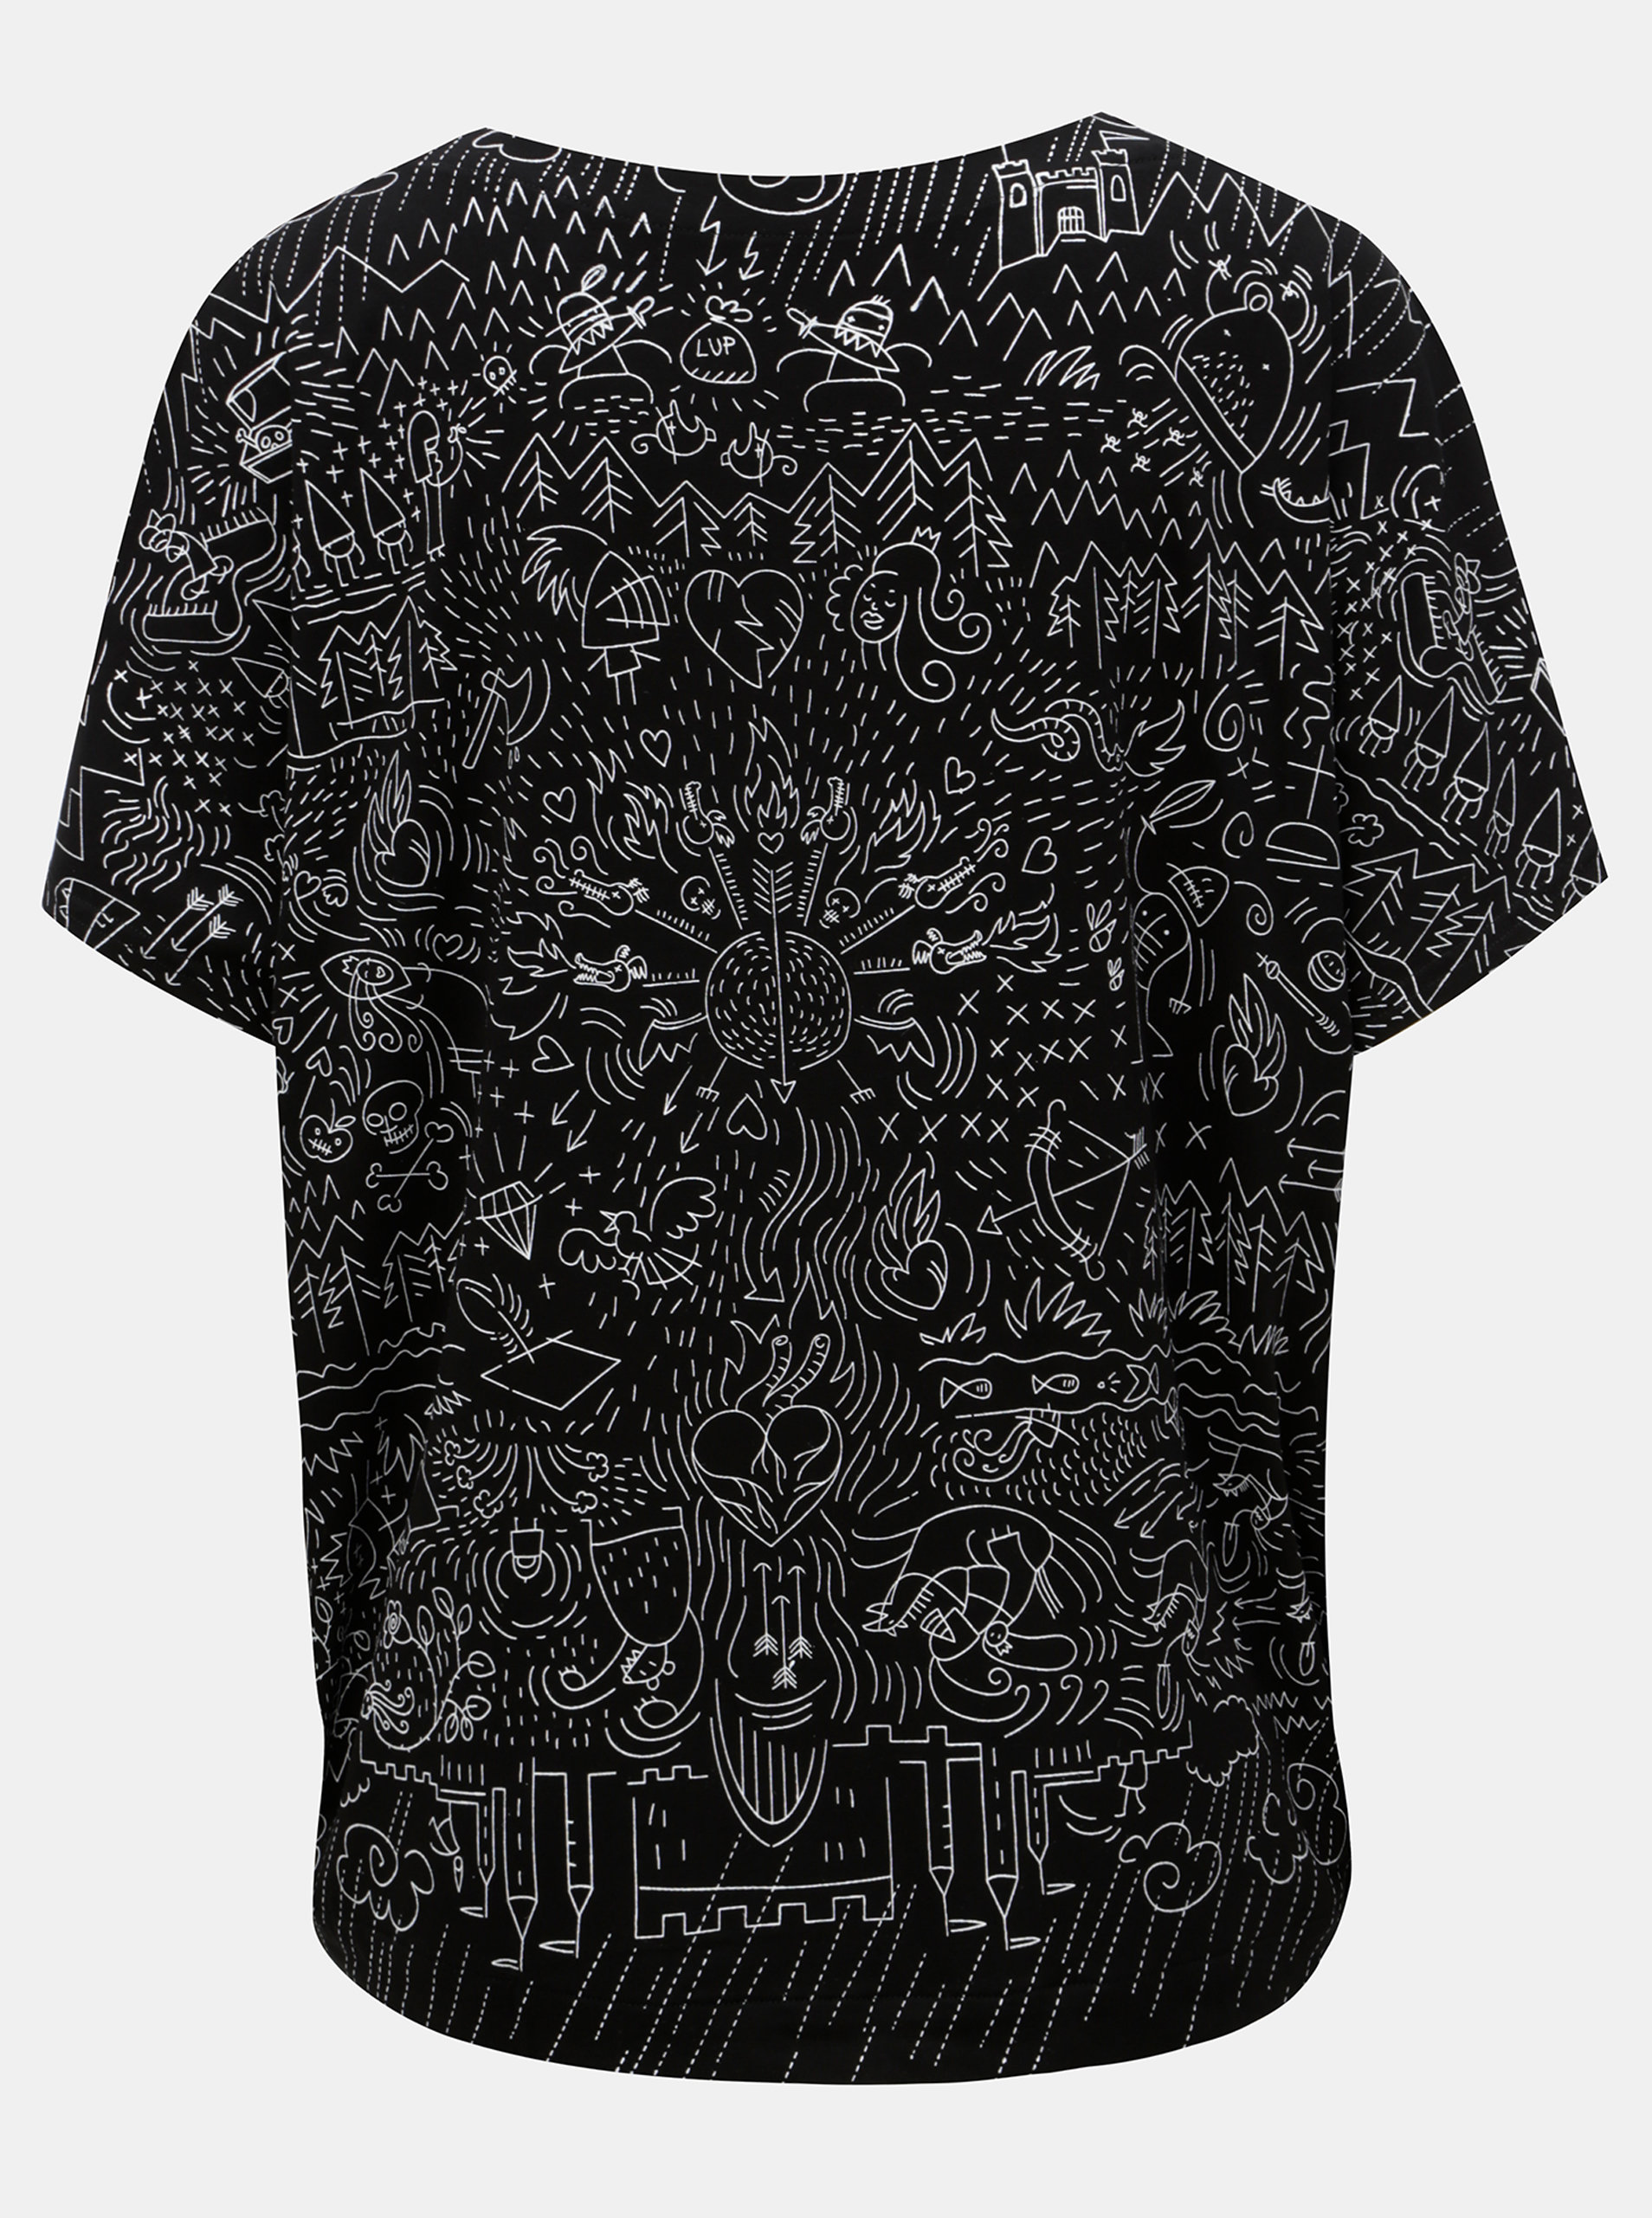 4b18304f9 Čierne oversize tričko s potlačou Mayda Pohádka | ZOOT.sk